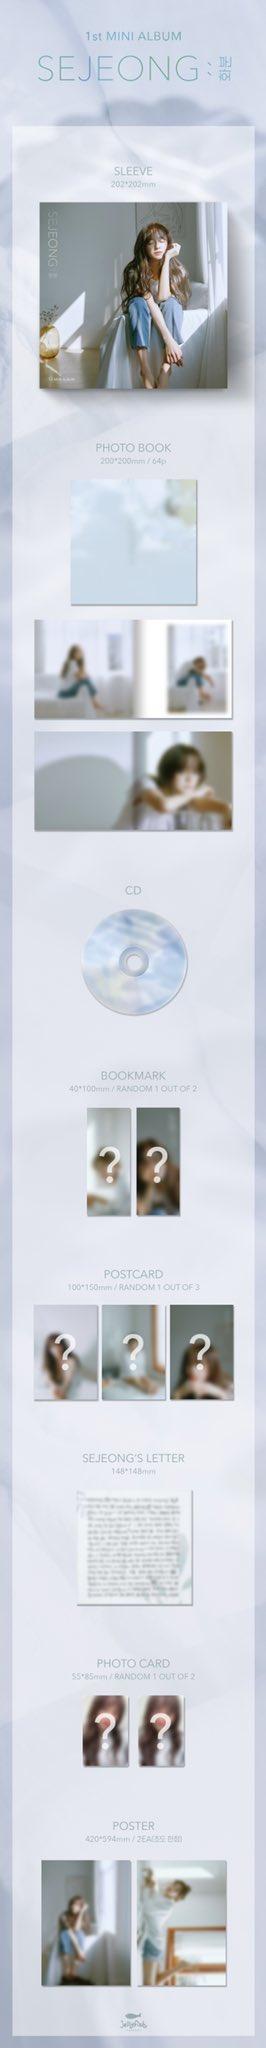 Kim Sejeong Album Packaging